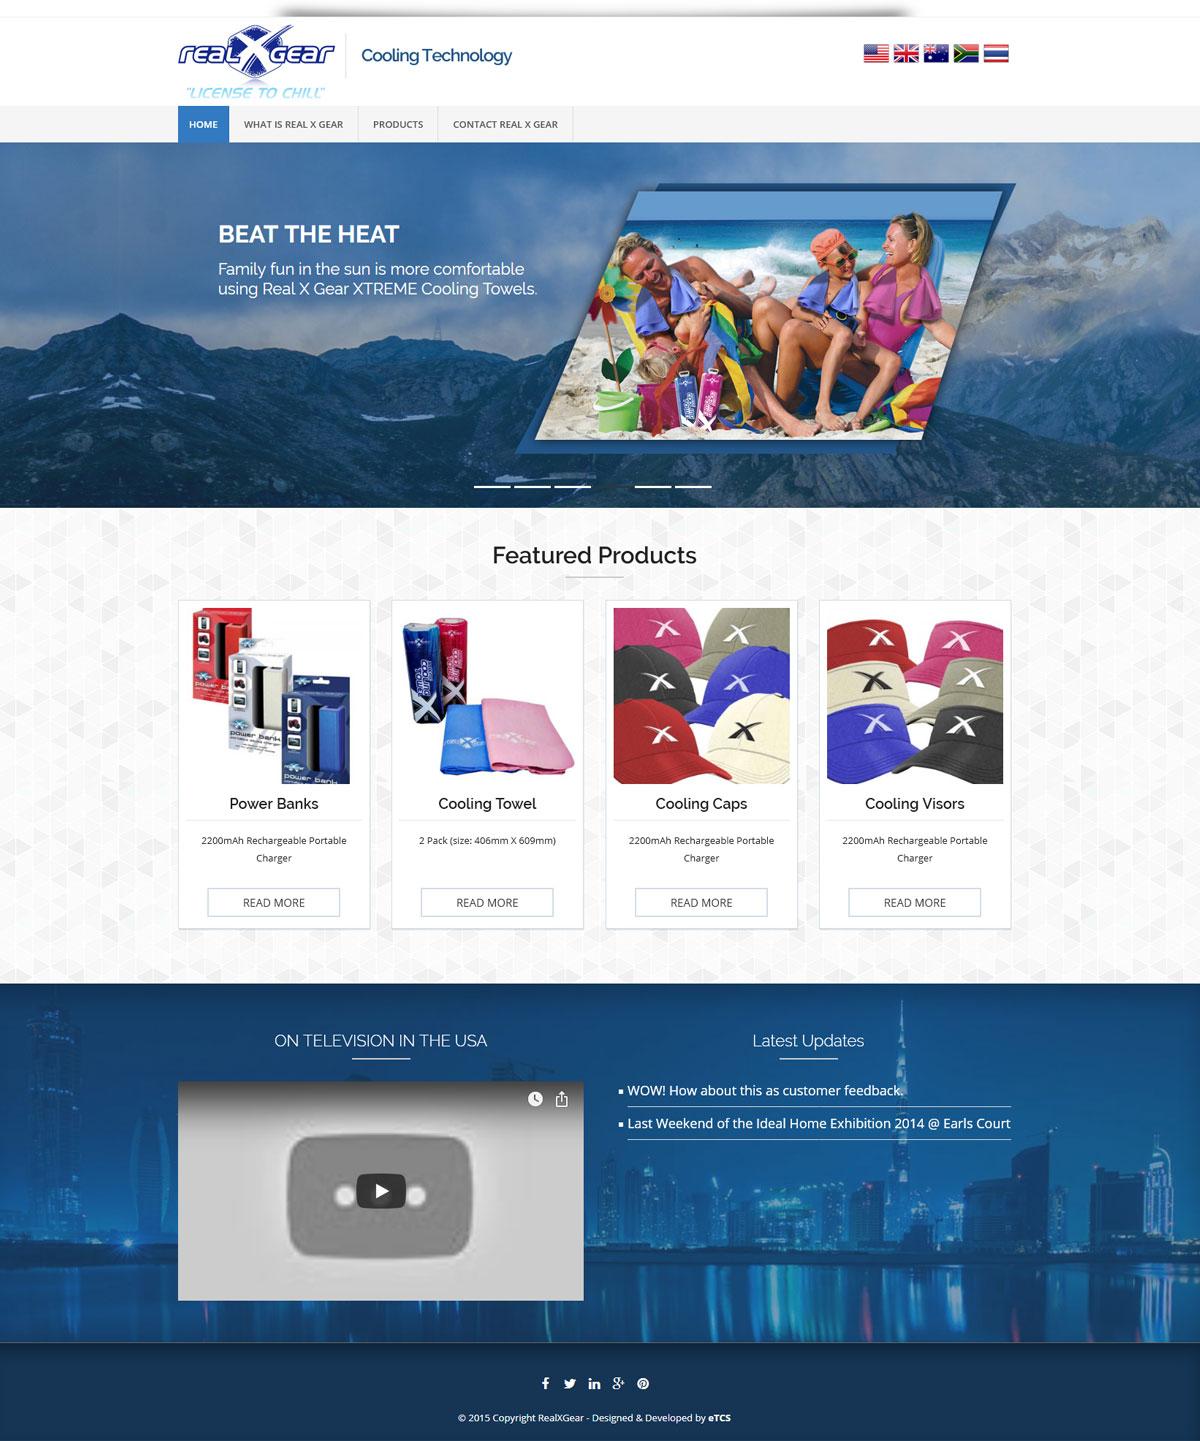 RealXGear Website Design & Development (WordPress)